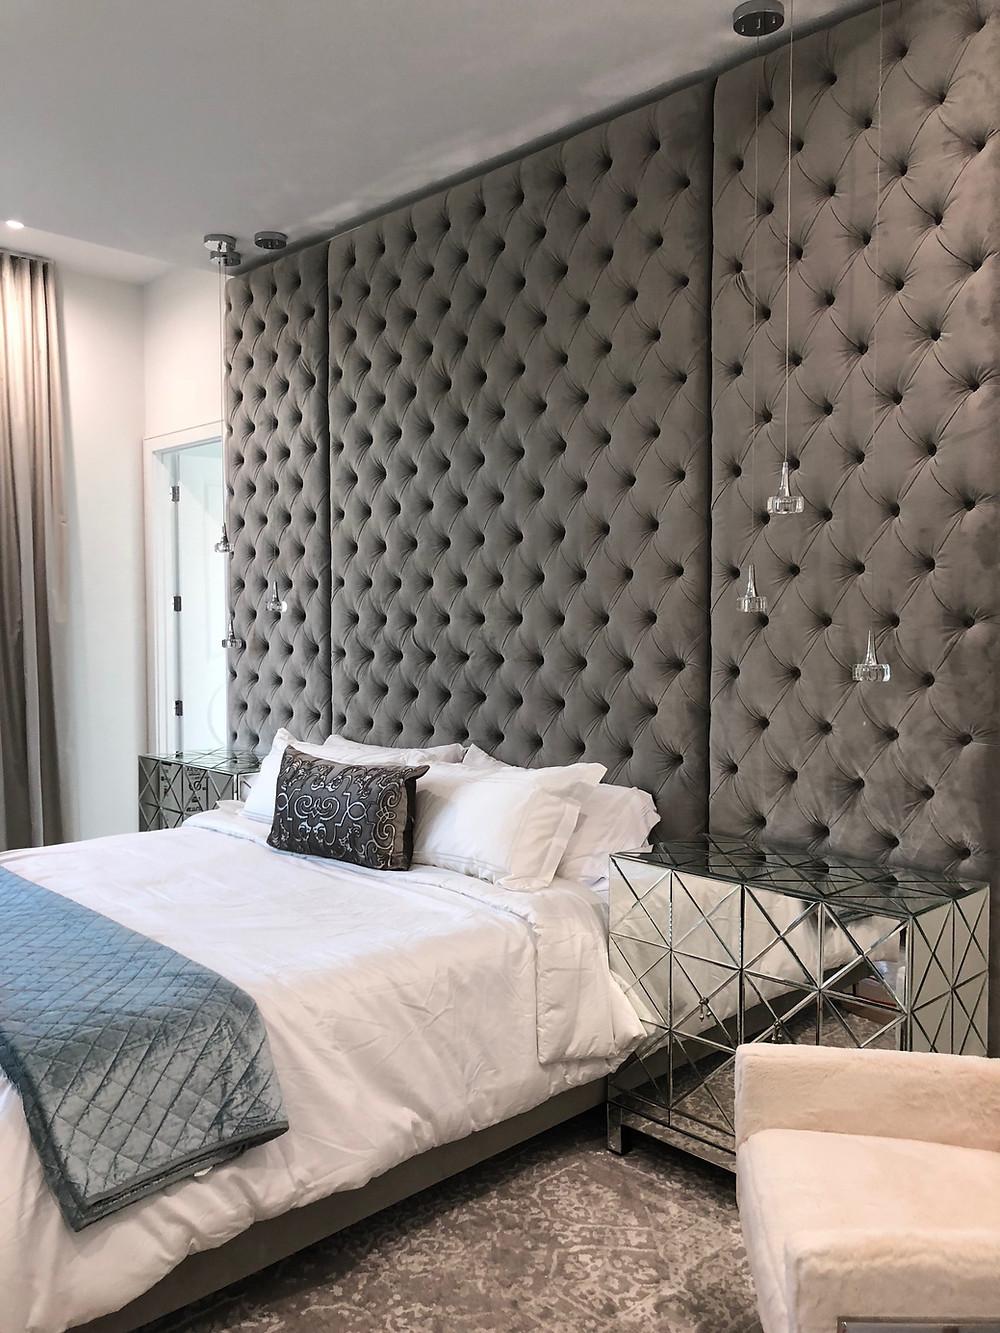 10 feet tall Deep Diamond Tufted Wall Panels